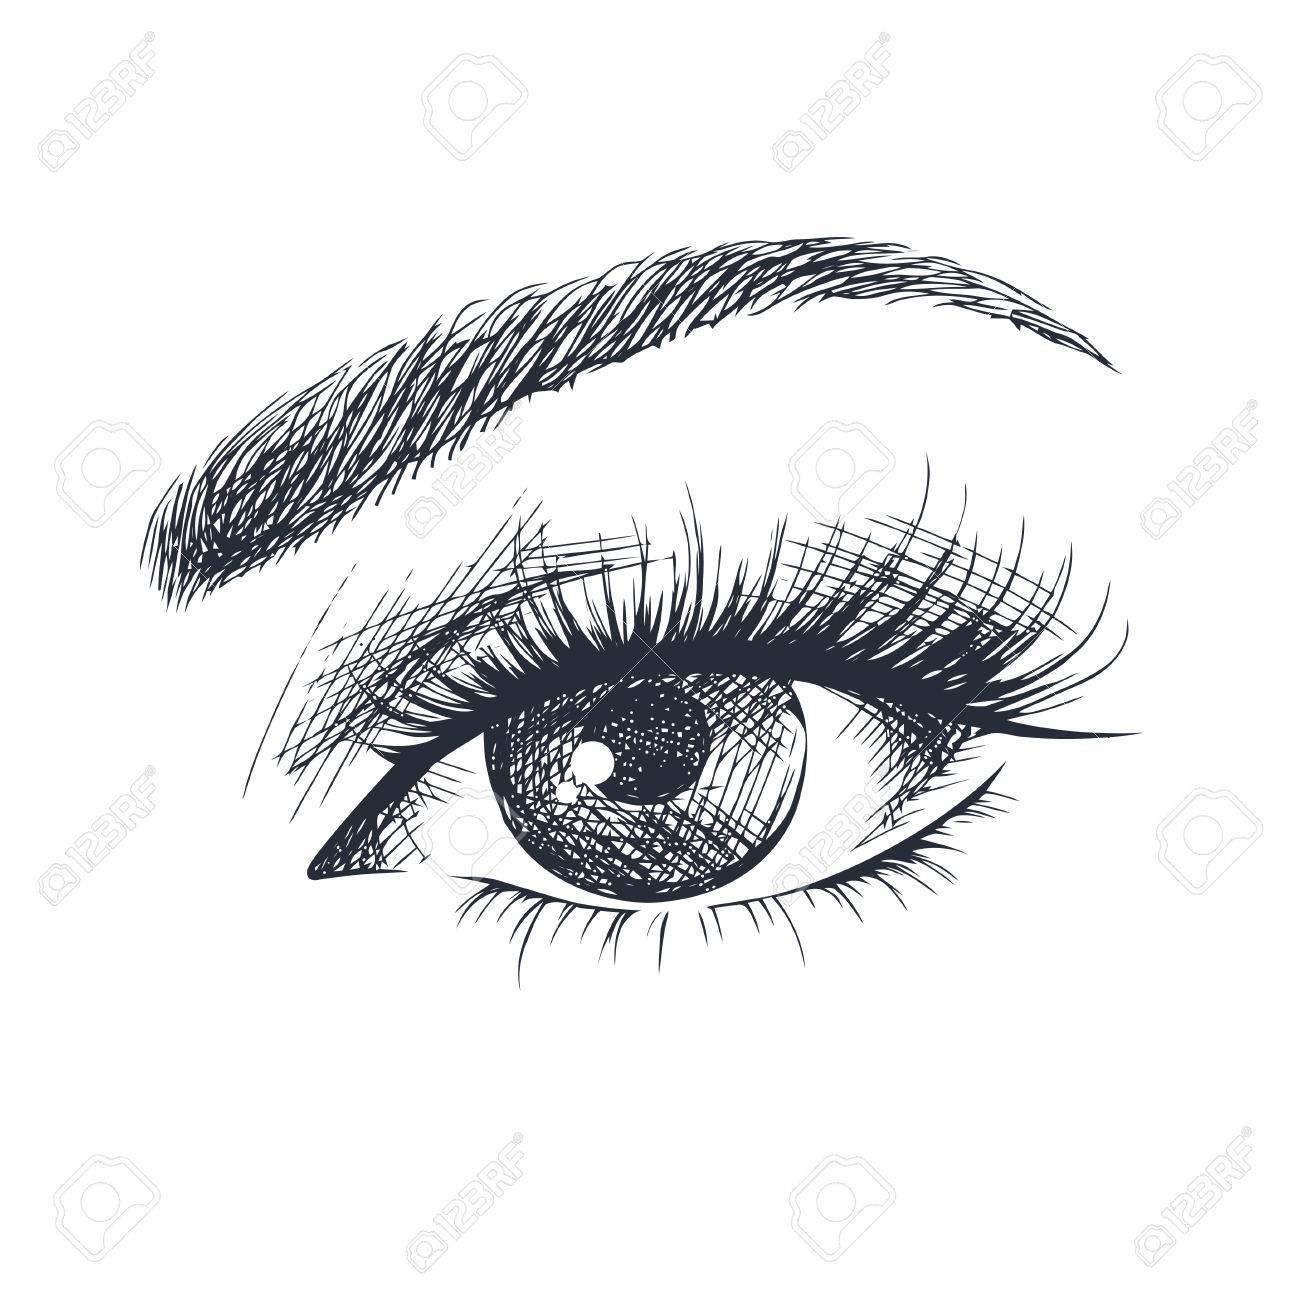 Hand-drawn beautiful female eye. - 77526378